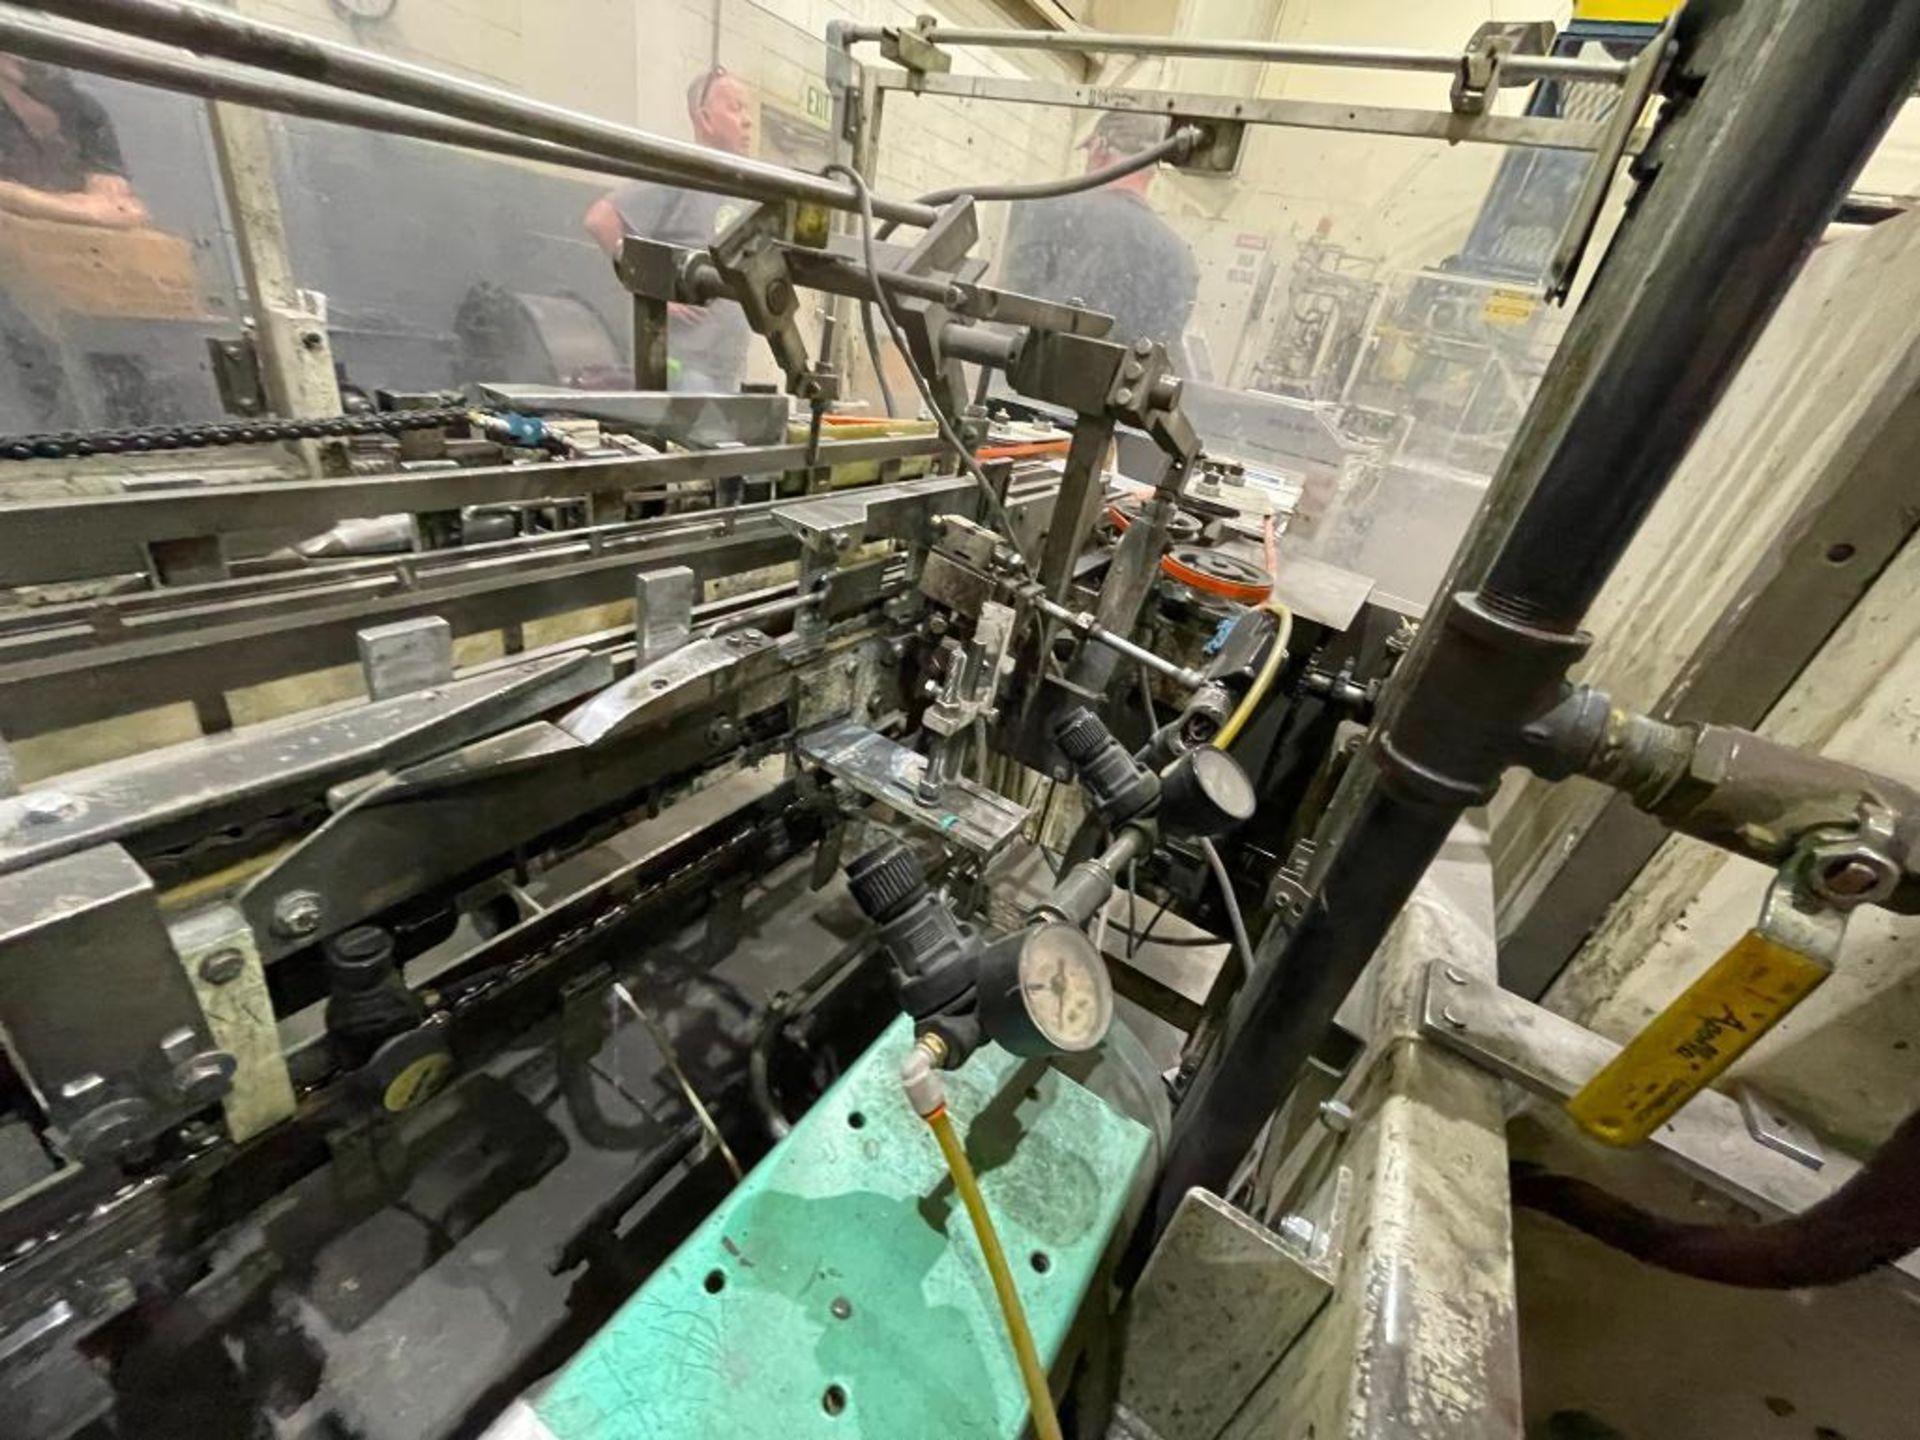 Hayes Machine Co. long goods cartoner, model 51BB - Image 53 of 64